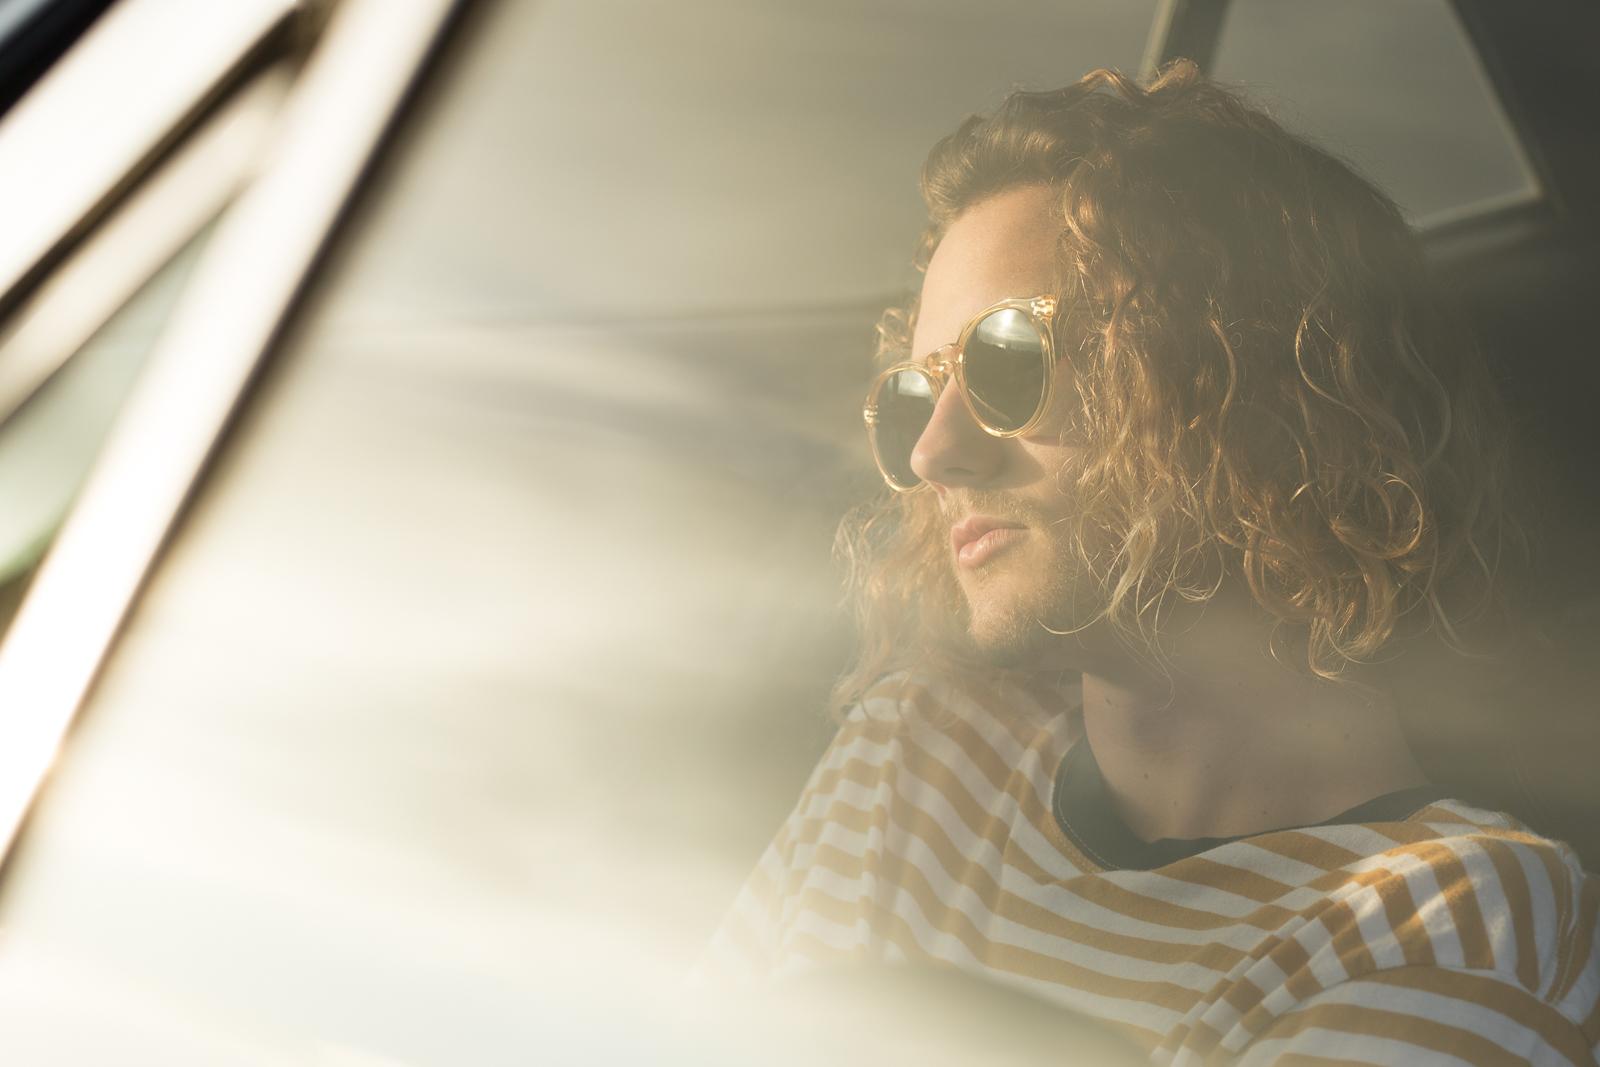 SunglassesLifestylePhotography